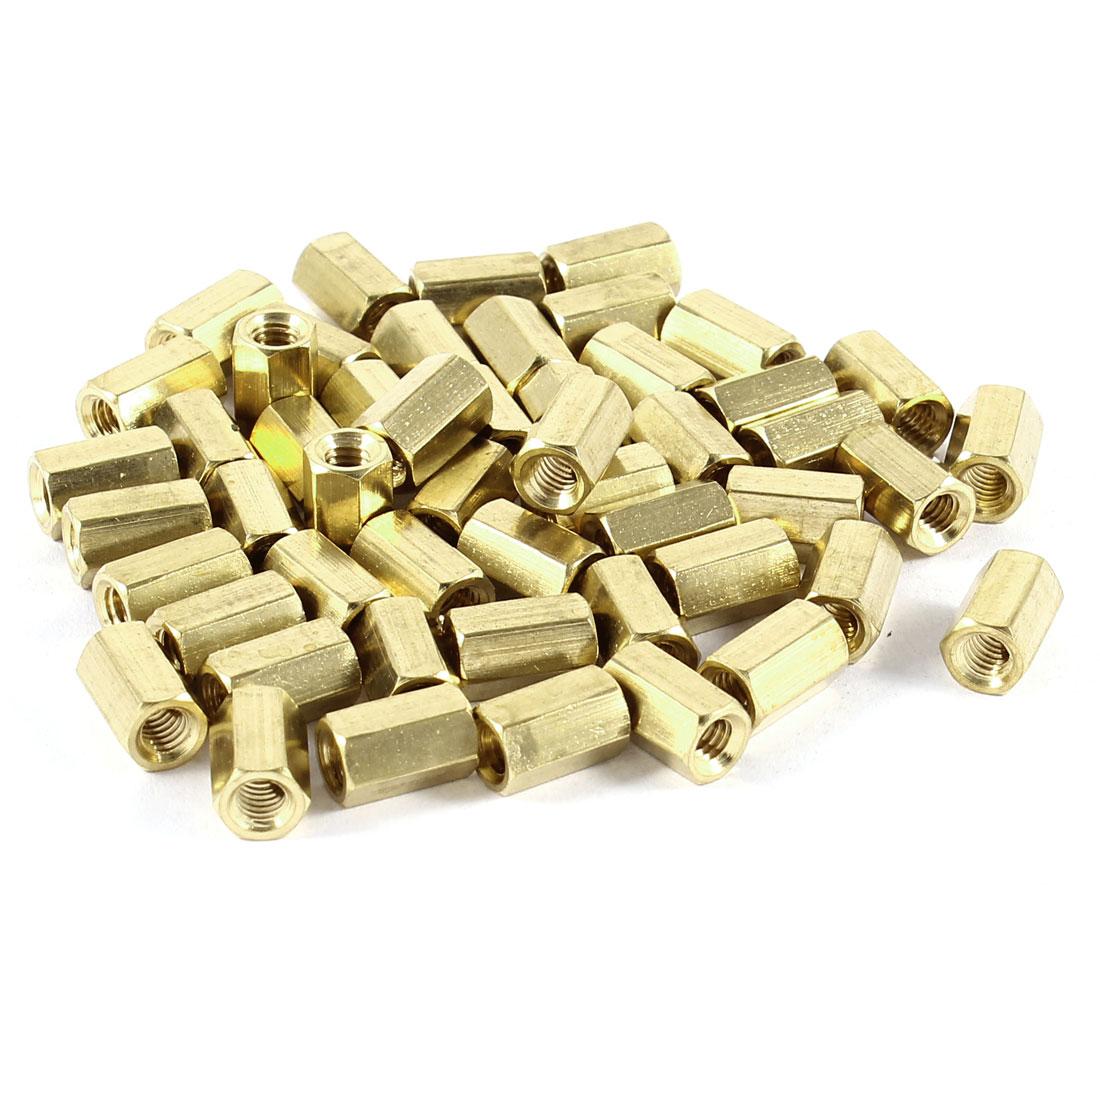 50 Pcs Hex Hexagon Female Nut Brass Standoff Spacer M4x10 M4 10mm